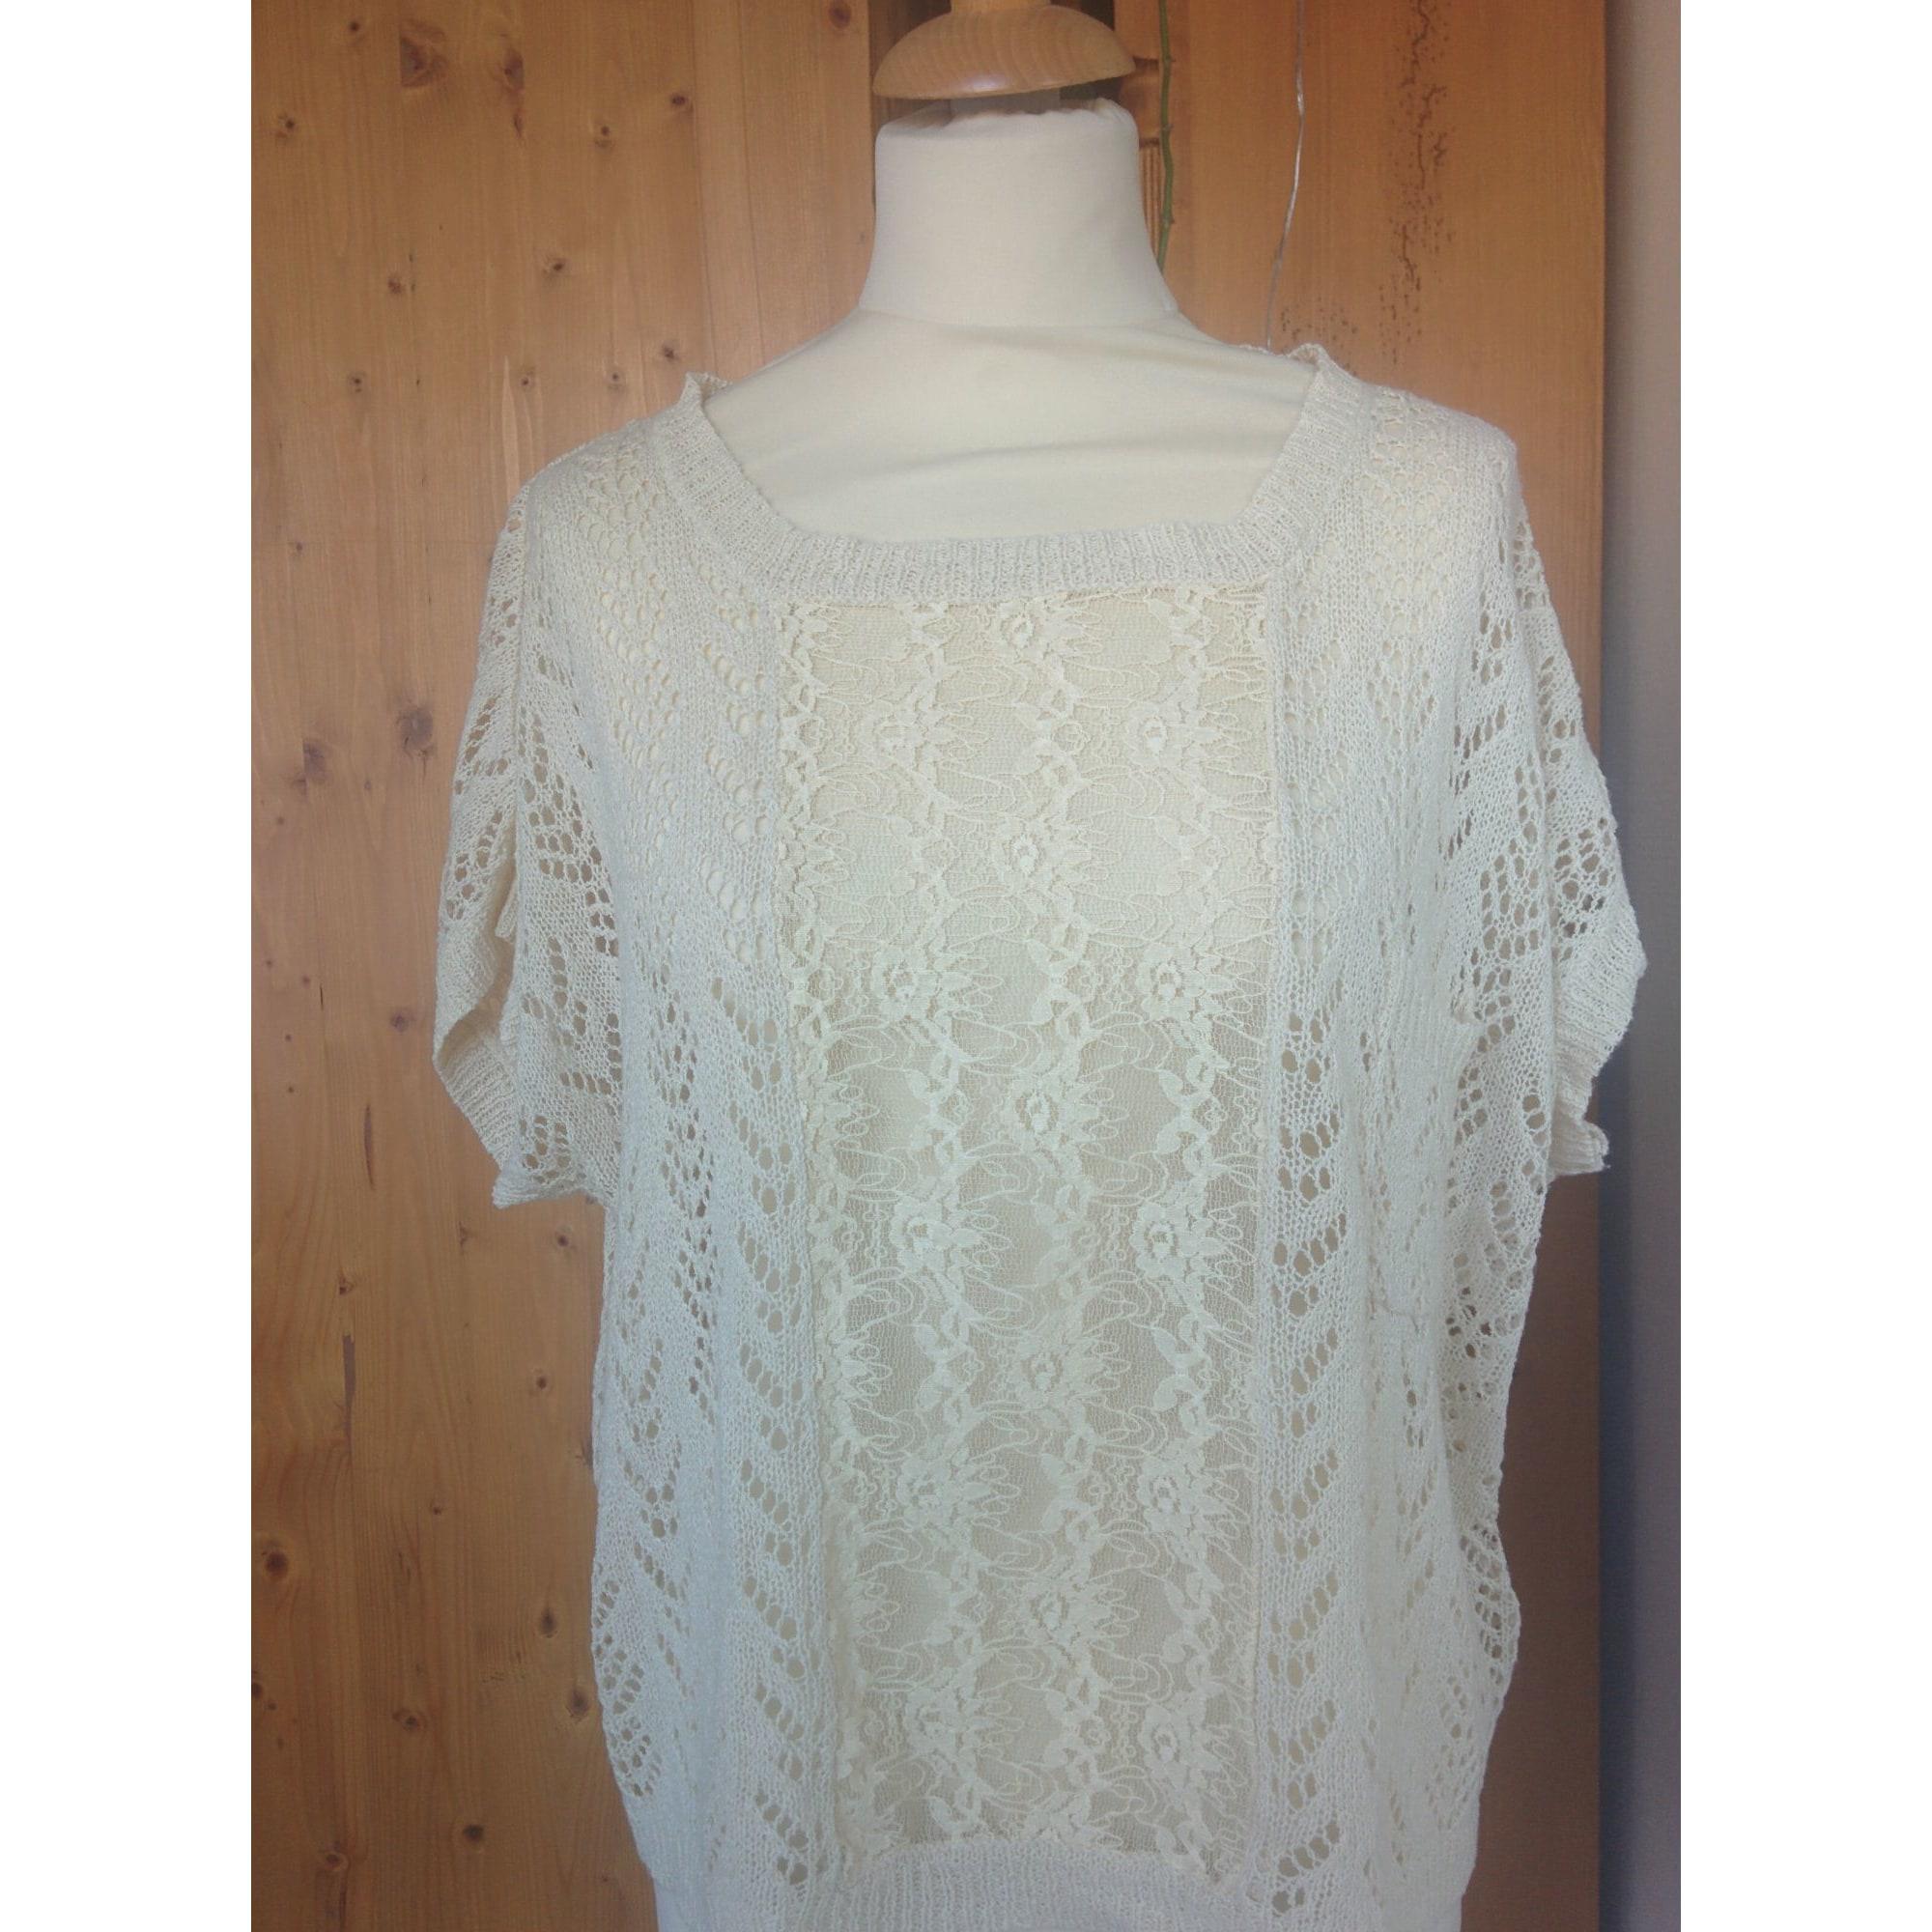 Top, tee-shirt RENÉ DERHY Blanc, blanc cassé, écru